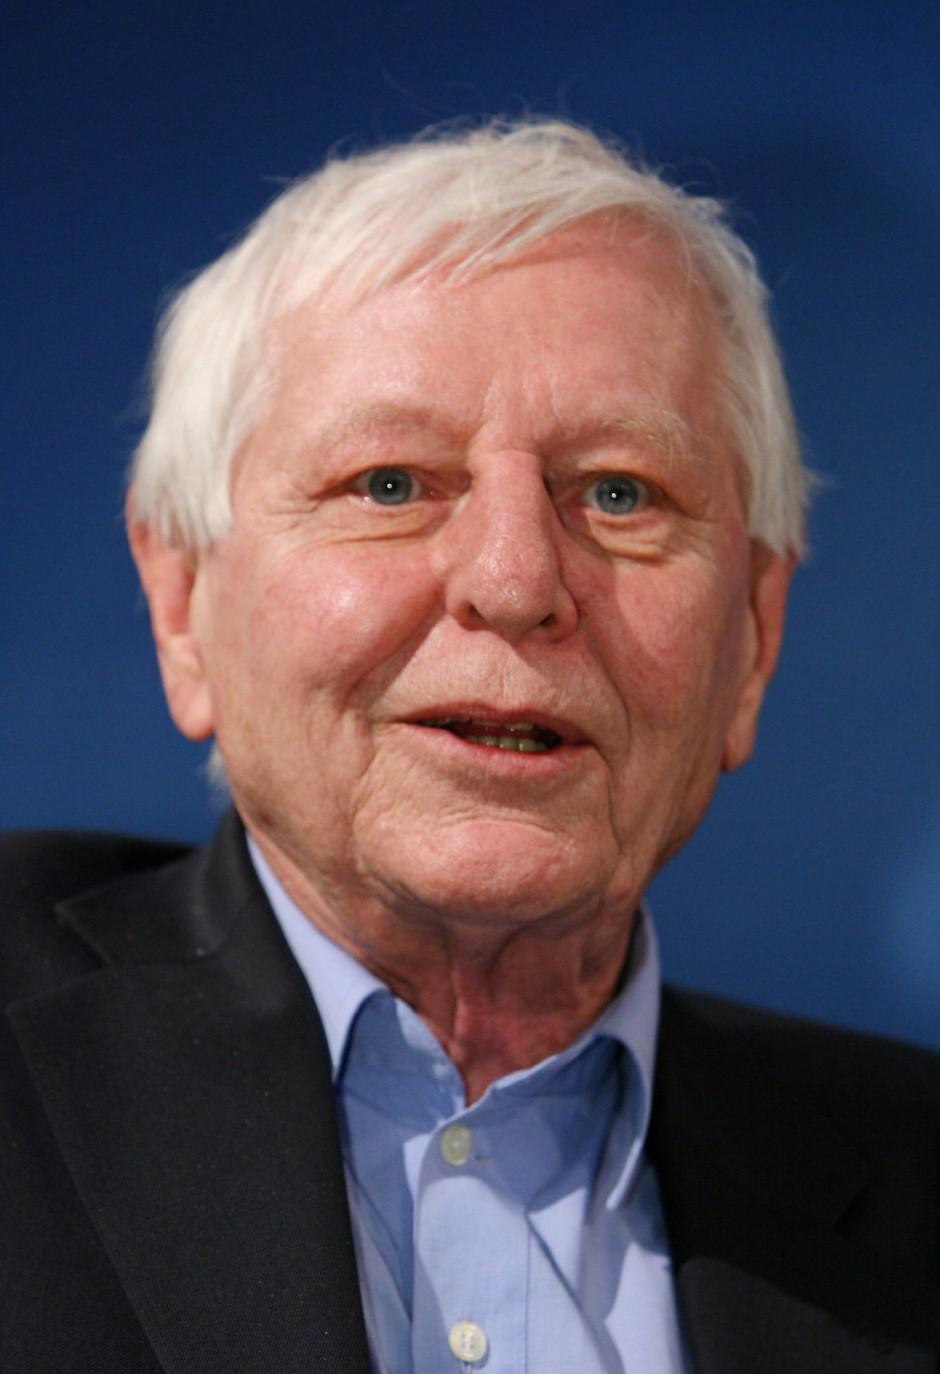 Hans Magnus Enzensberger salary